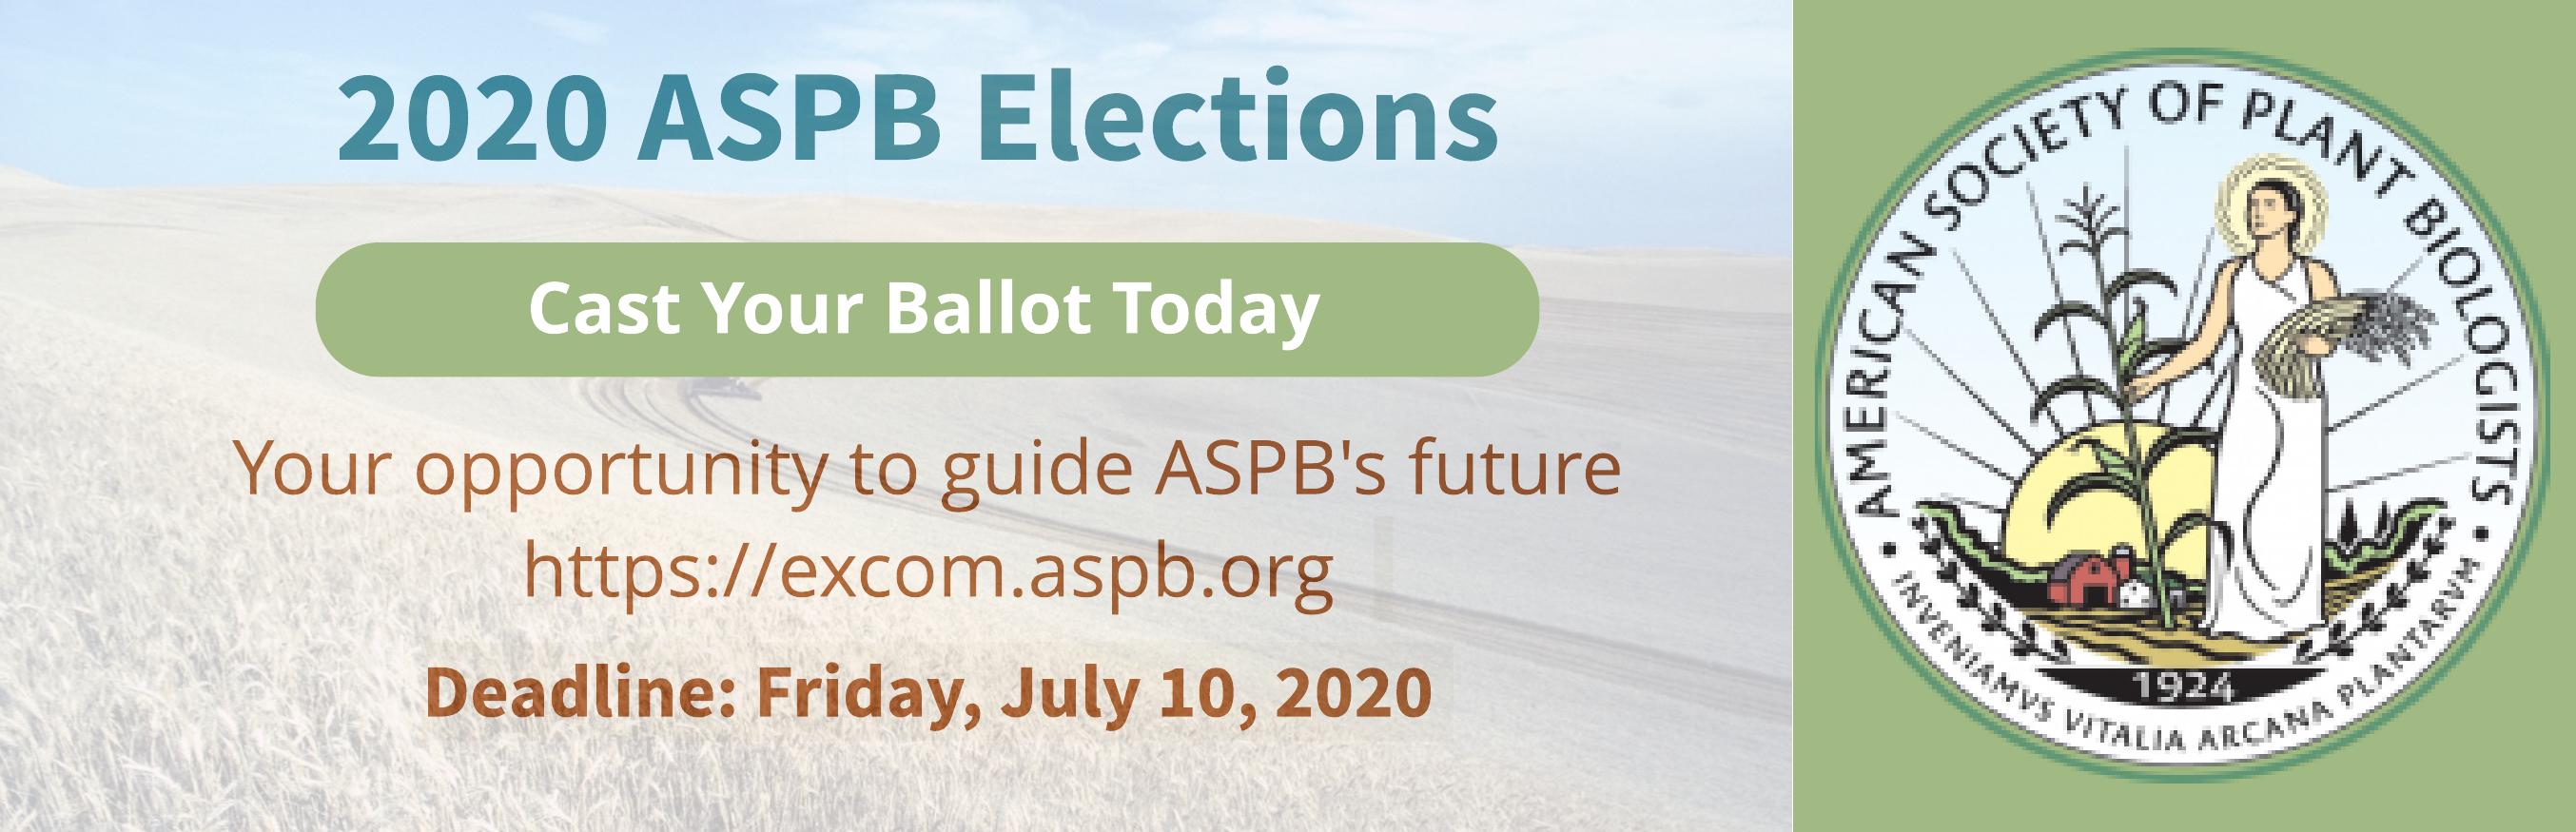 2020 ASPB Election